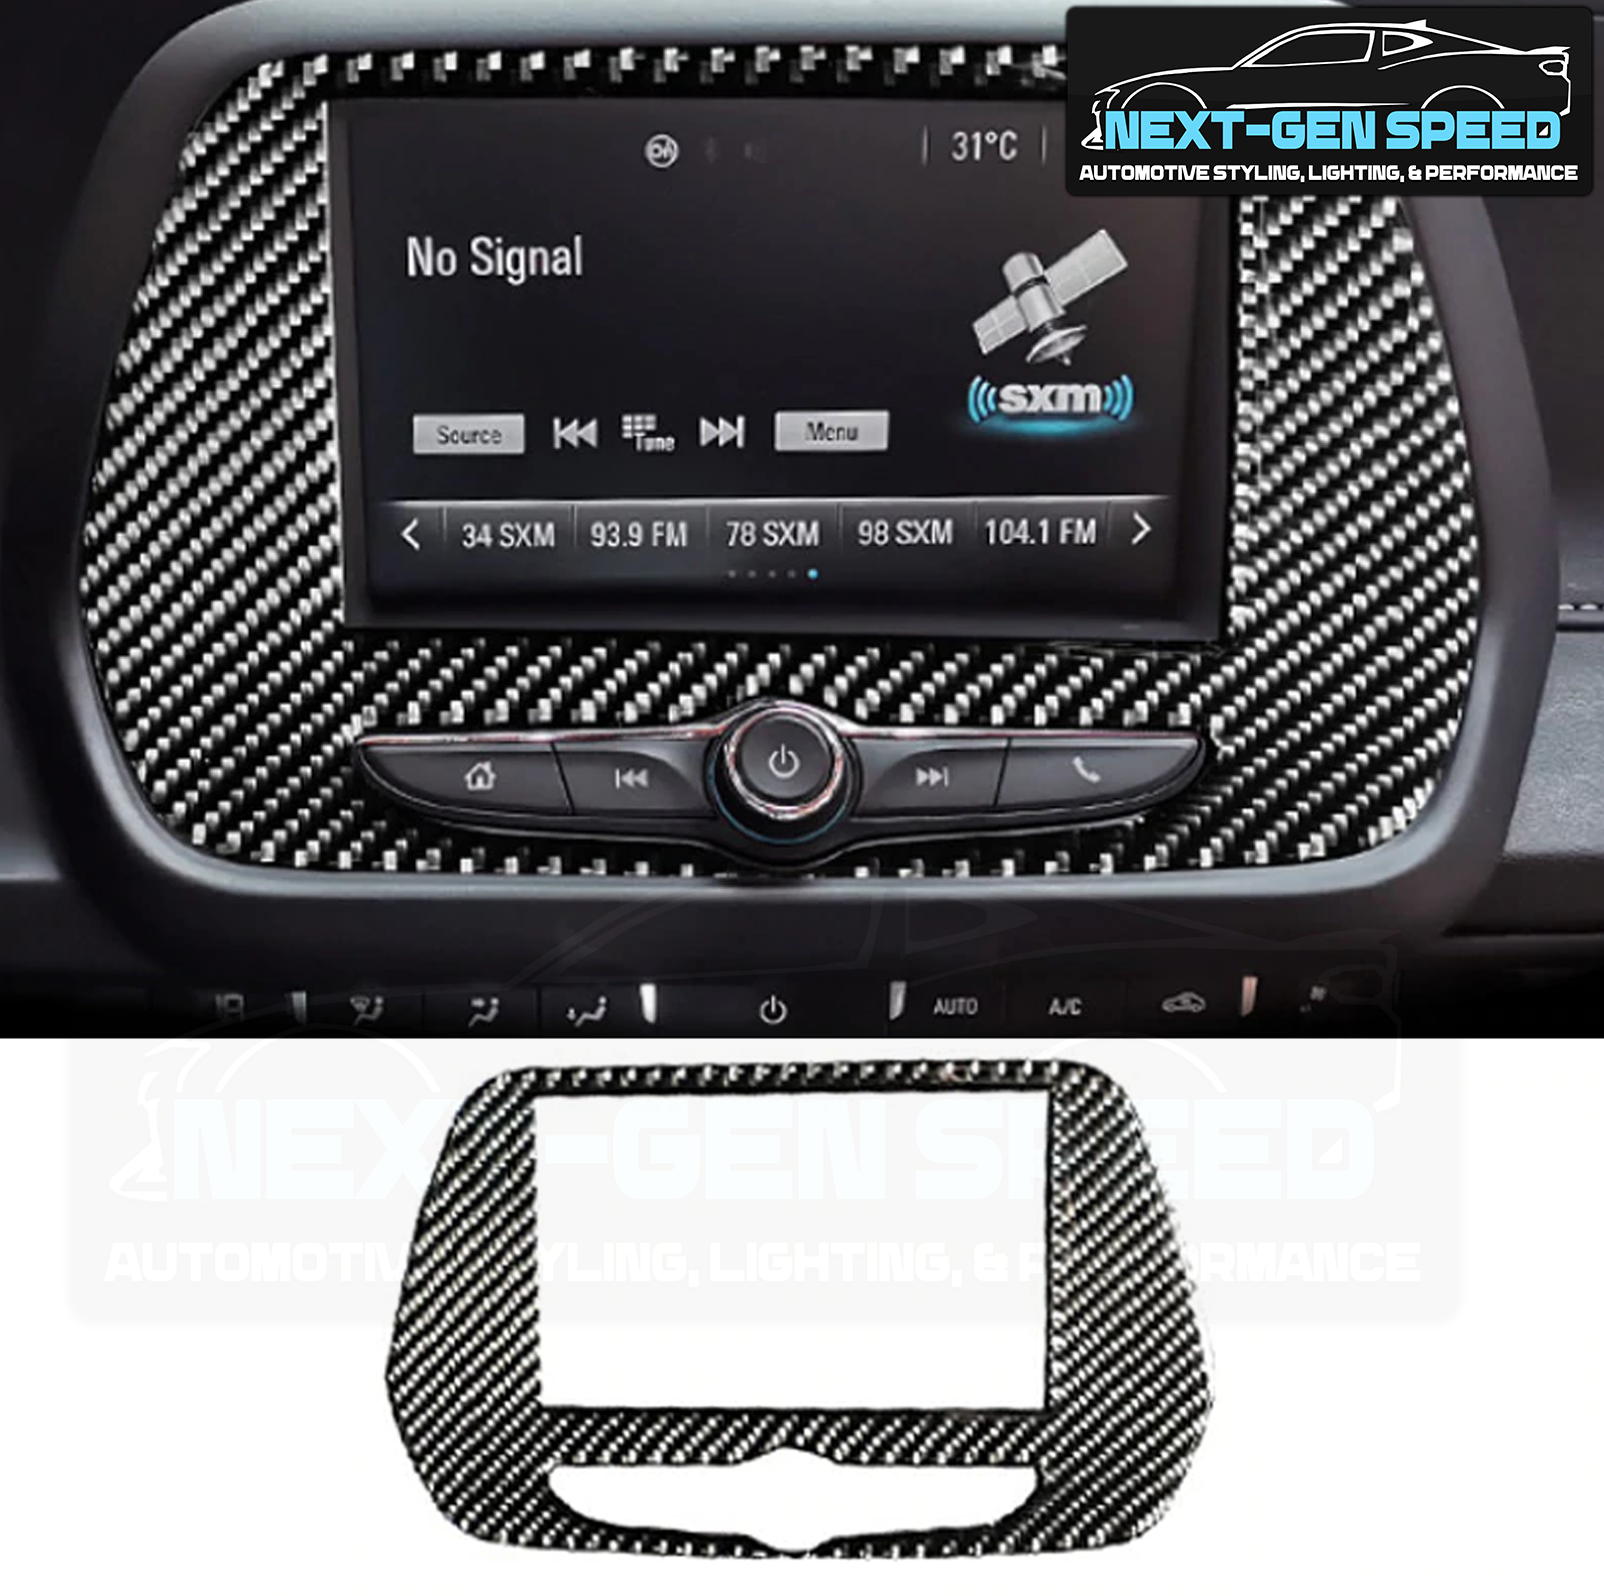 Next-Gen Speed Carbon Fiber Push Button Start Trim Cover for Camaro 2016 2017 2018 2019 2020 Glossy Carbon Cover Transformers Logo